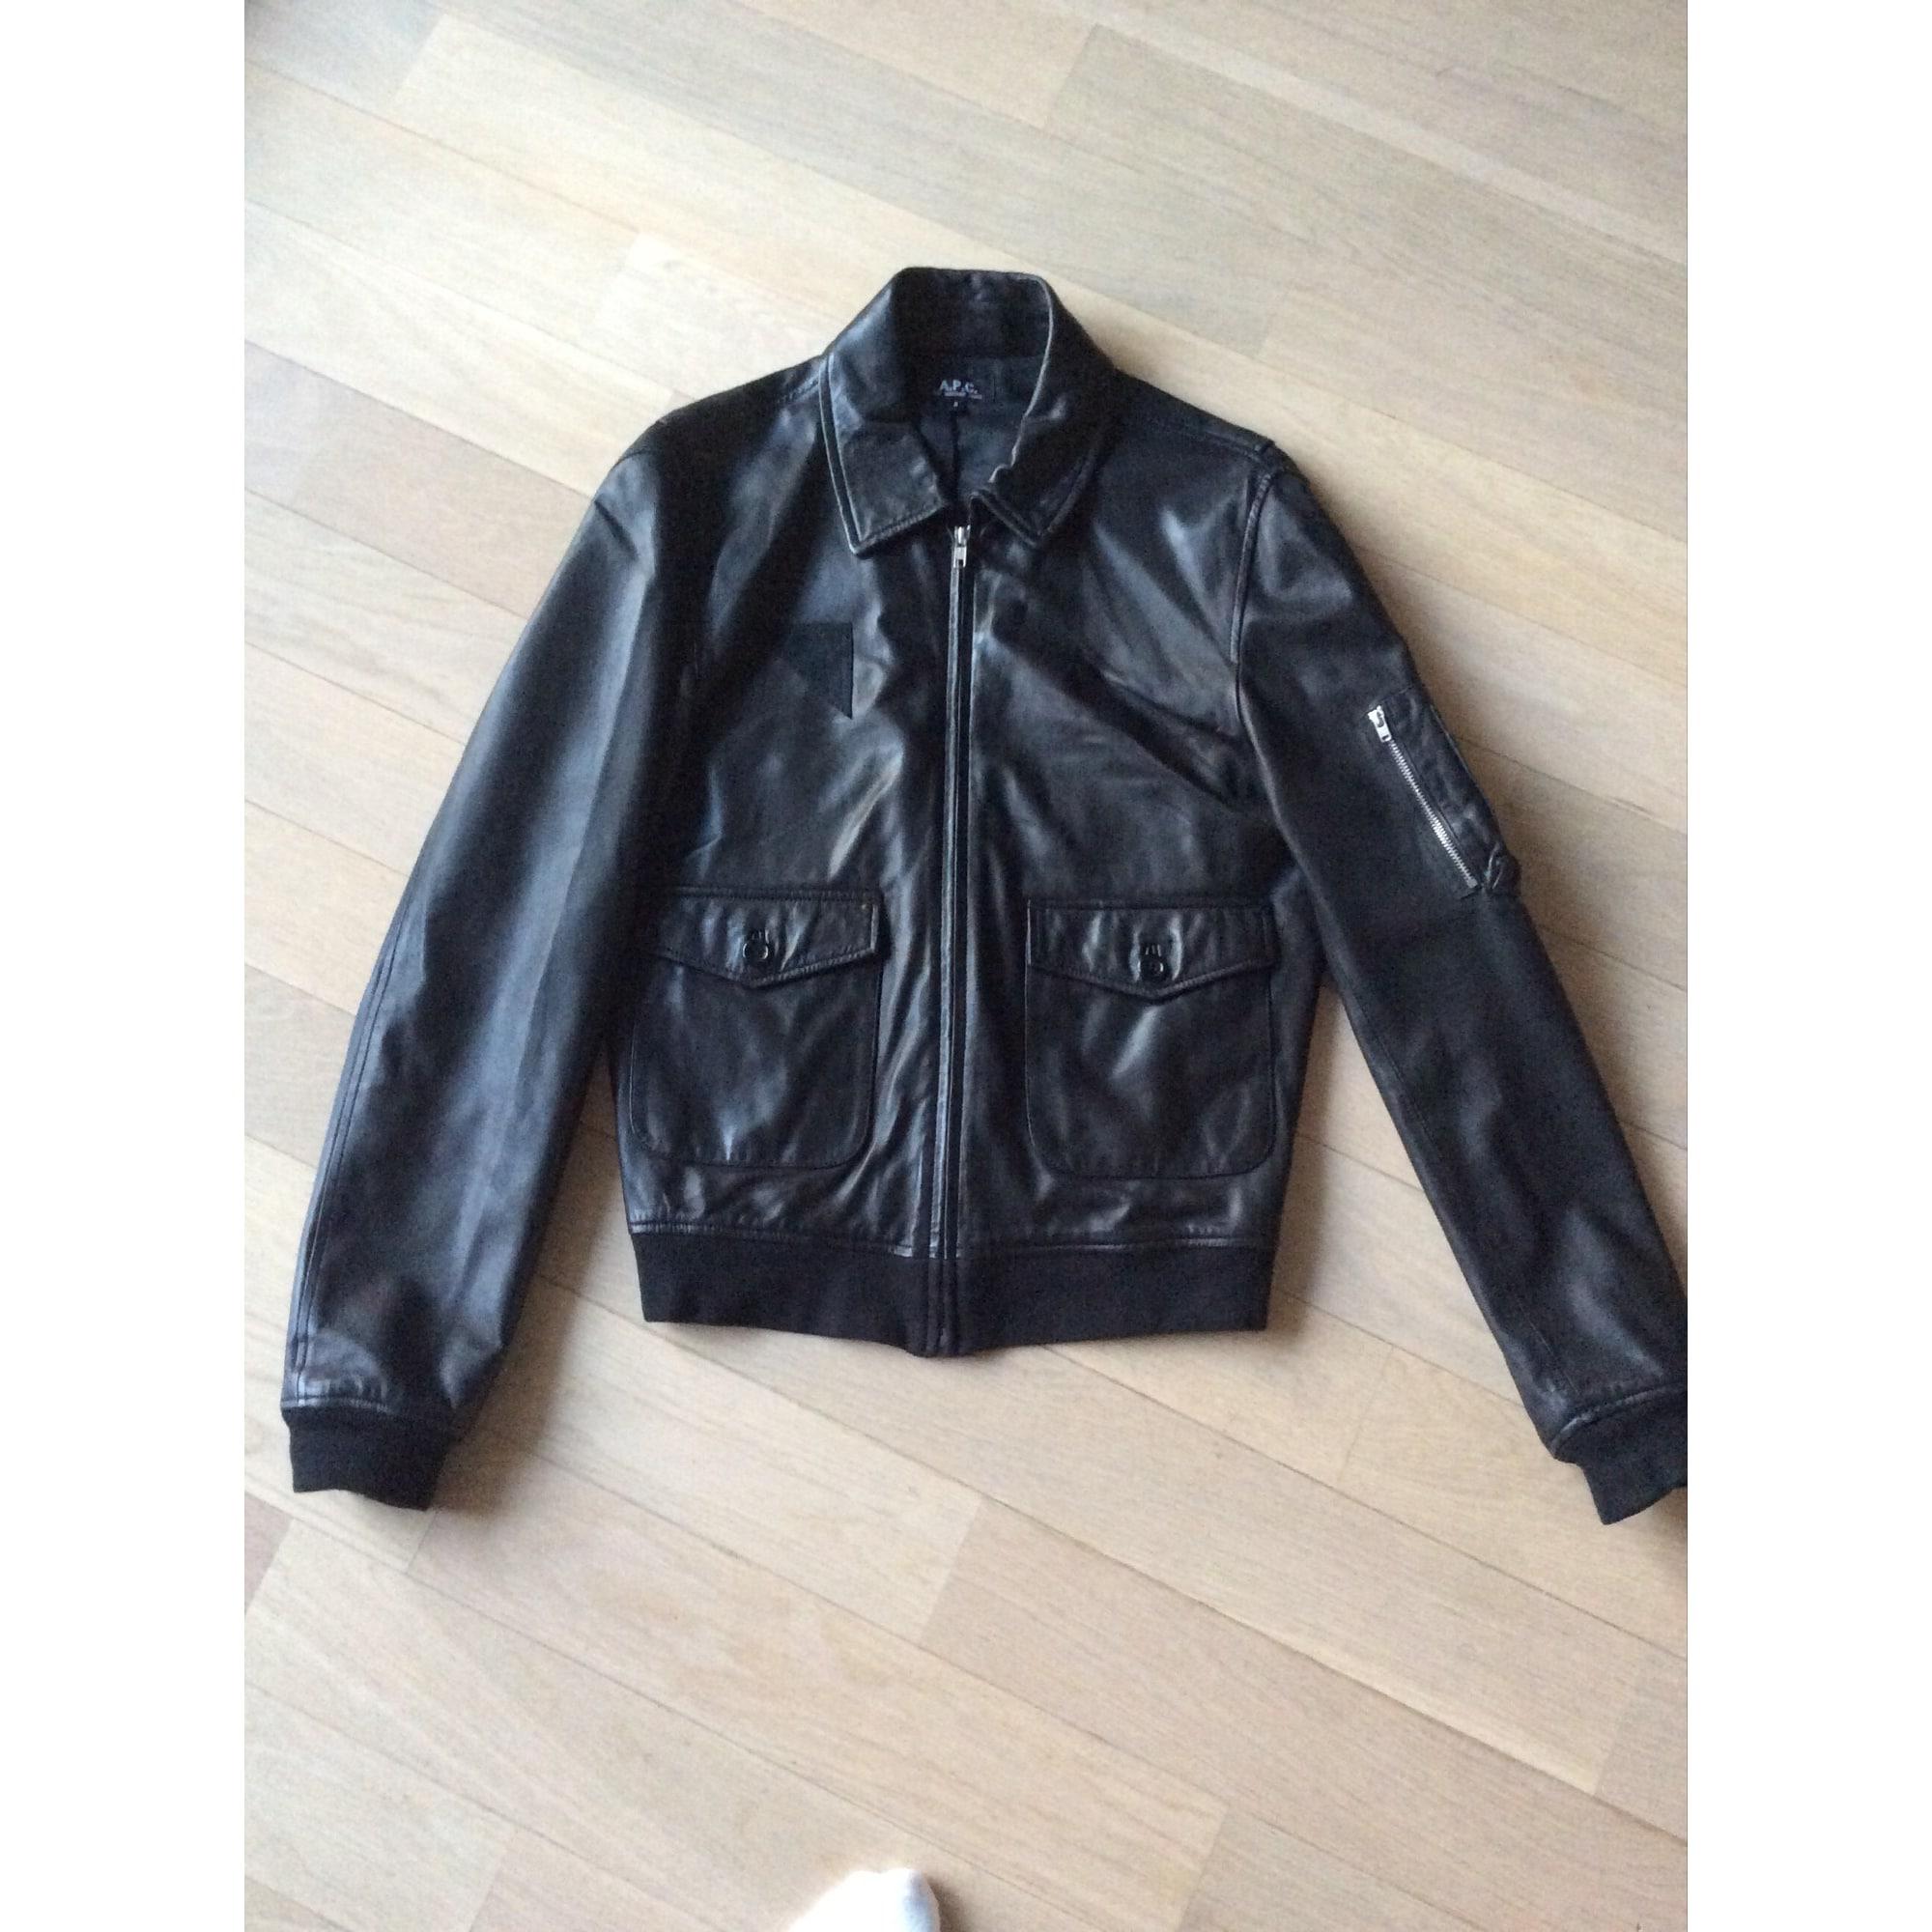 ac666c1c3f901 Blouson en cuir A.P.C. 44 (S) noir vendu par Sebastien 1058 - 6920997